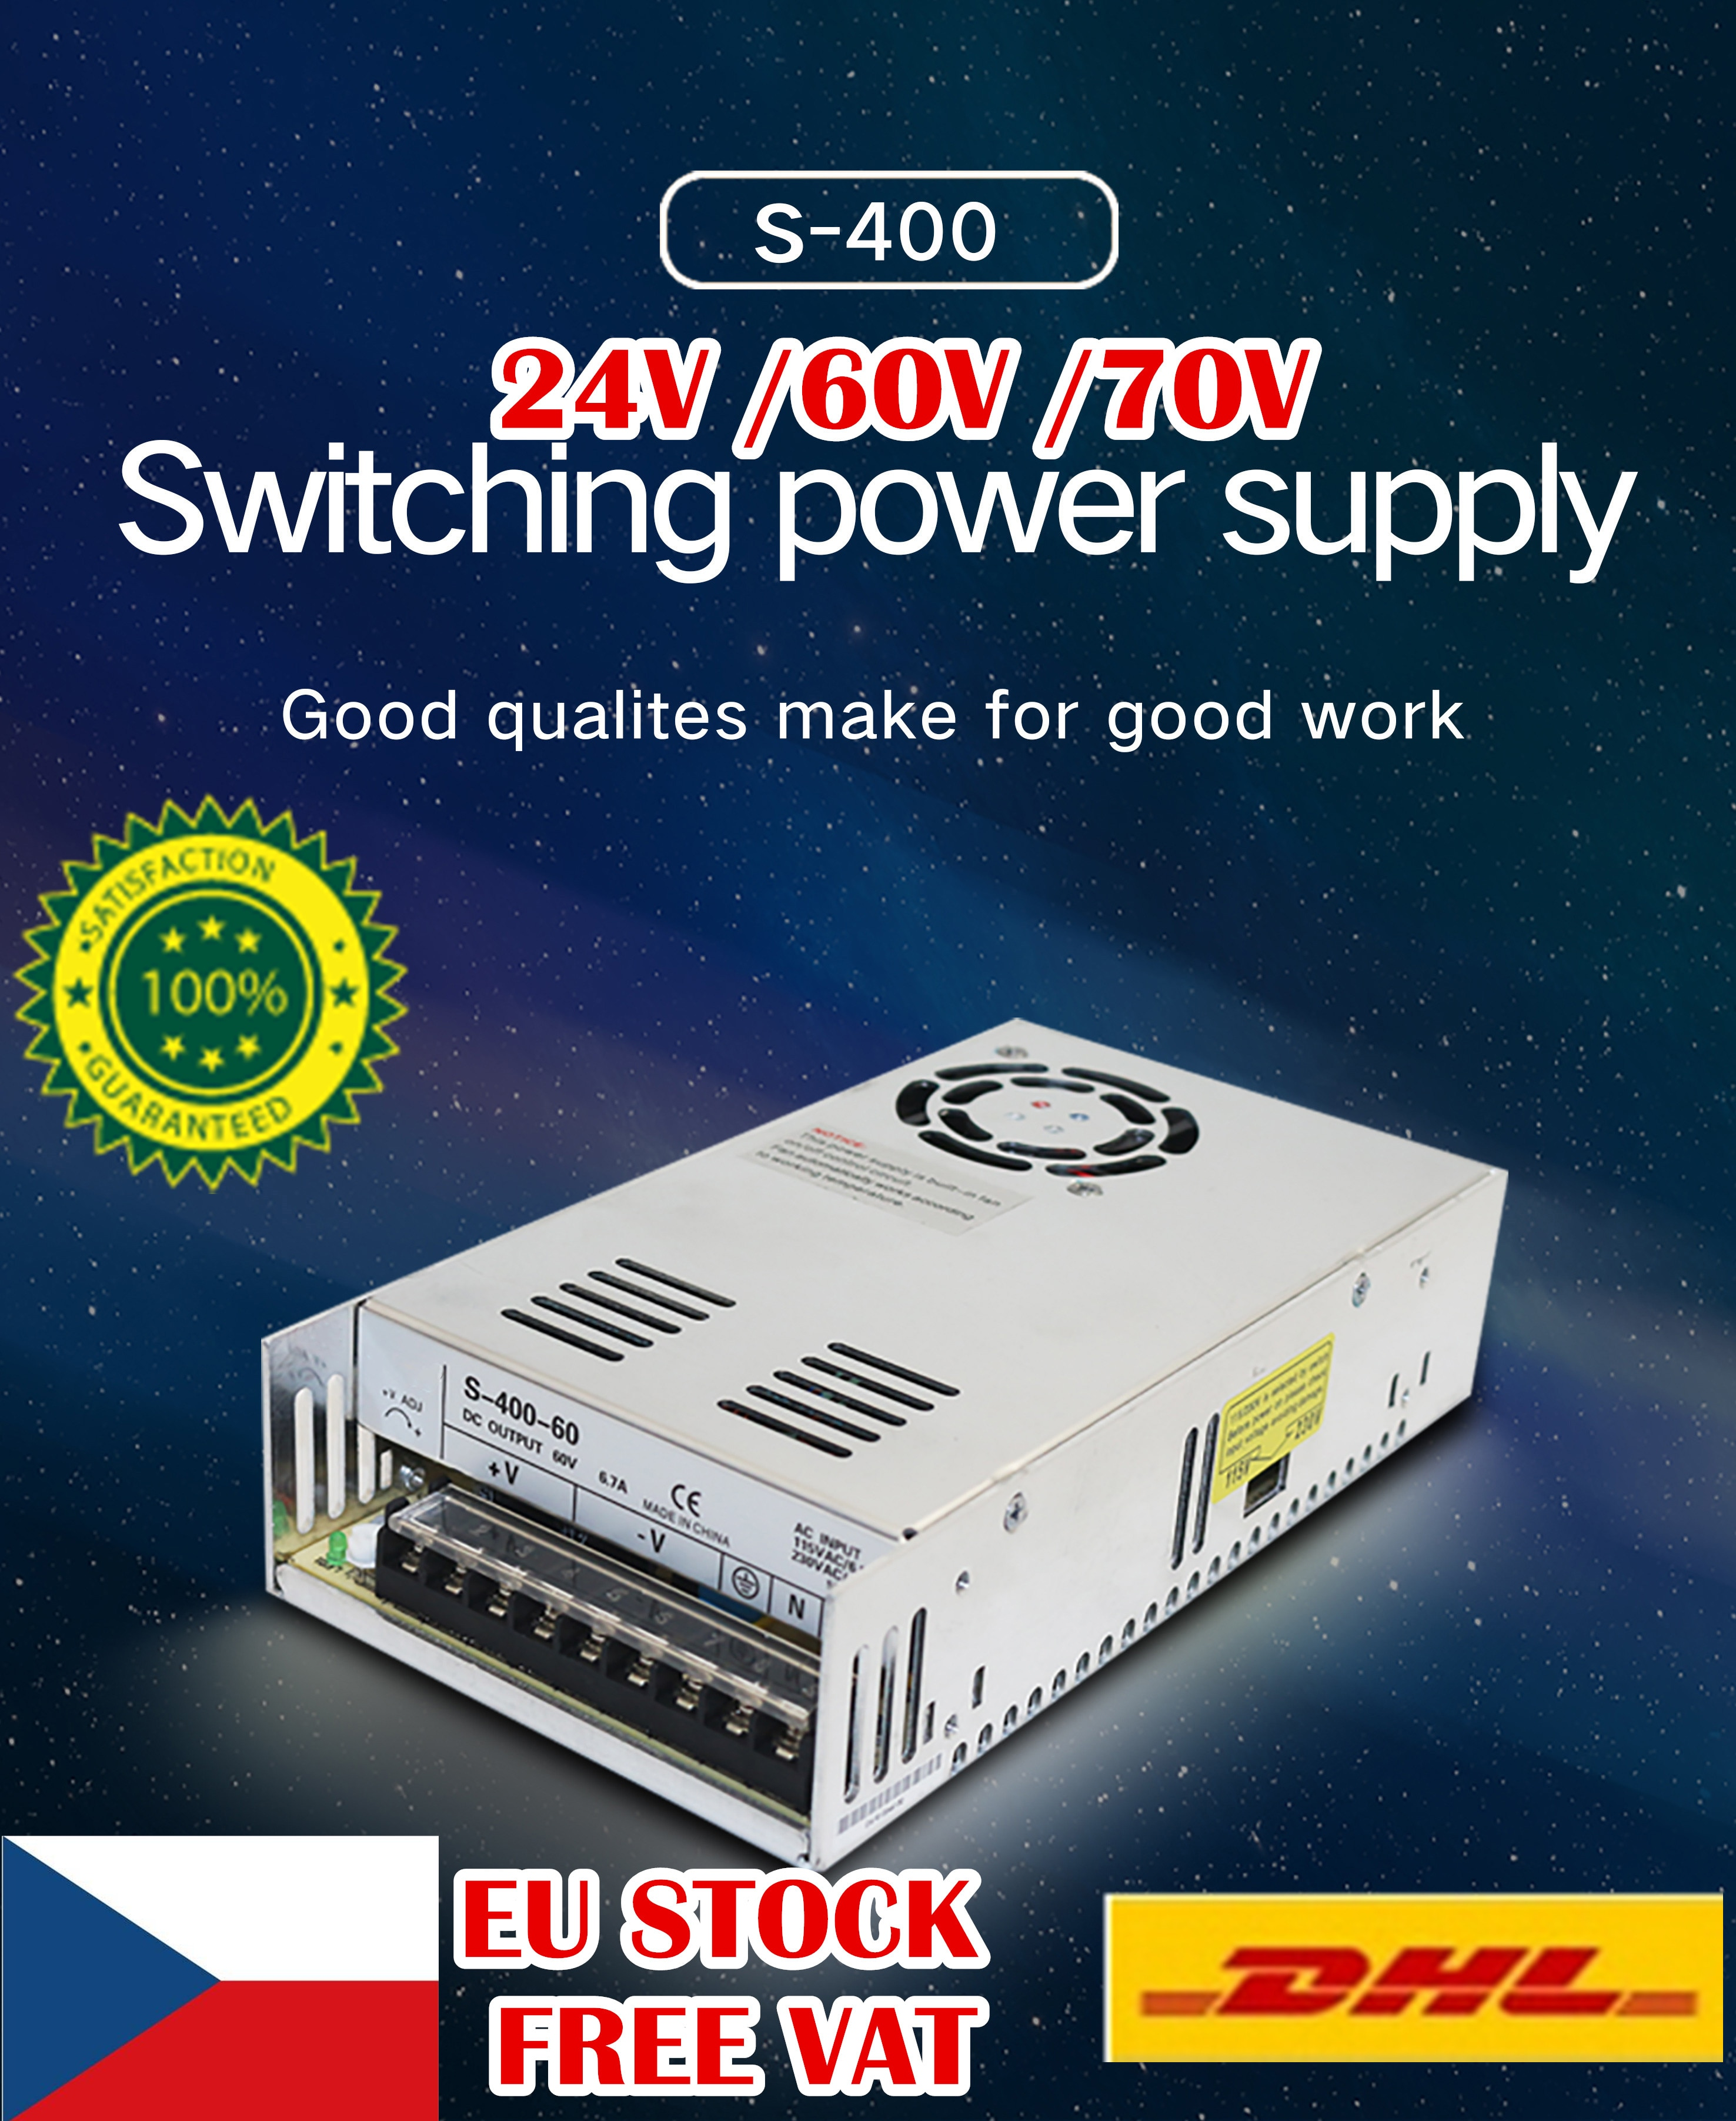 [EU Free VAT] 400W 24V /60V / 70V DC Switch Power Supply S-400 CNC Router Single Output Foaming Mill Cut Engraver Plasma